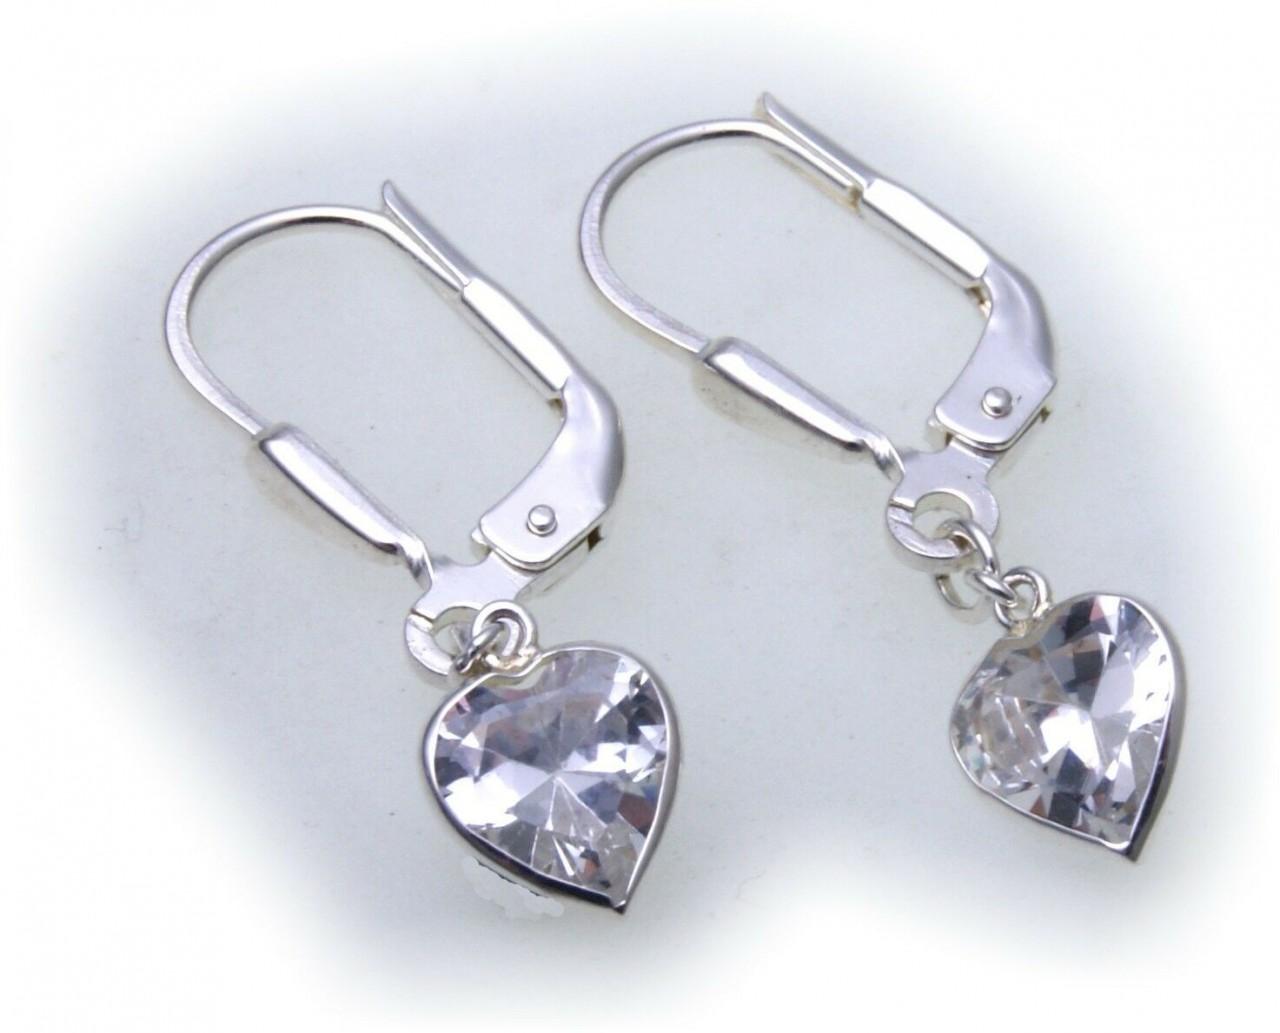 Damen Ohrringe Hänger Herz Zirkonia Silber 925 Ohrhänger Sterlingsilber Z2081 ZI